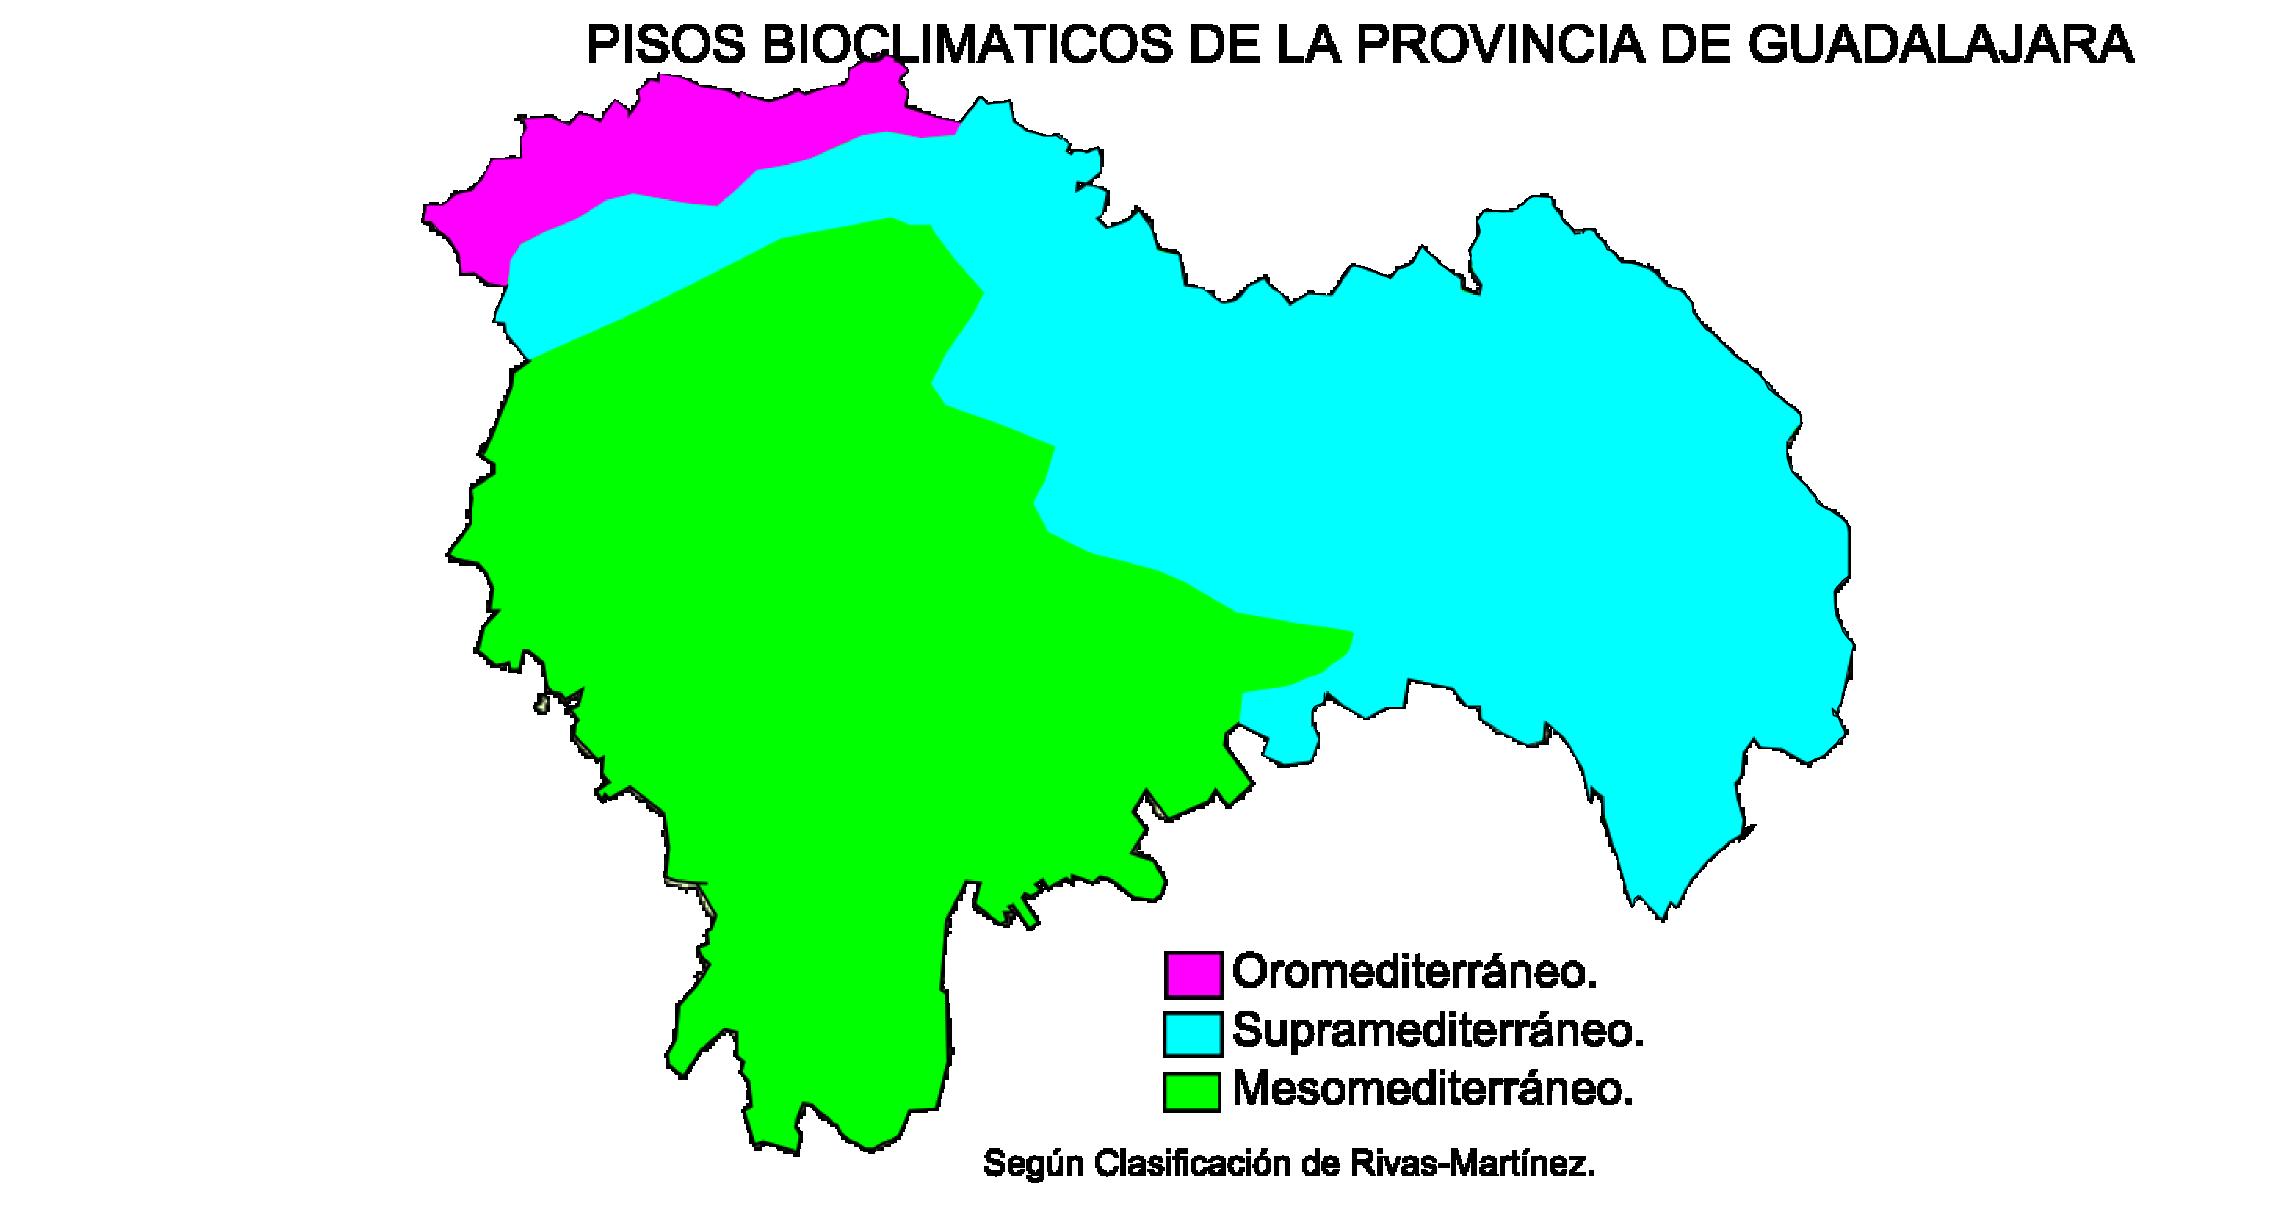 Bioclimatic zones of the province of Guadalajara 2009